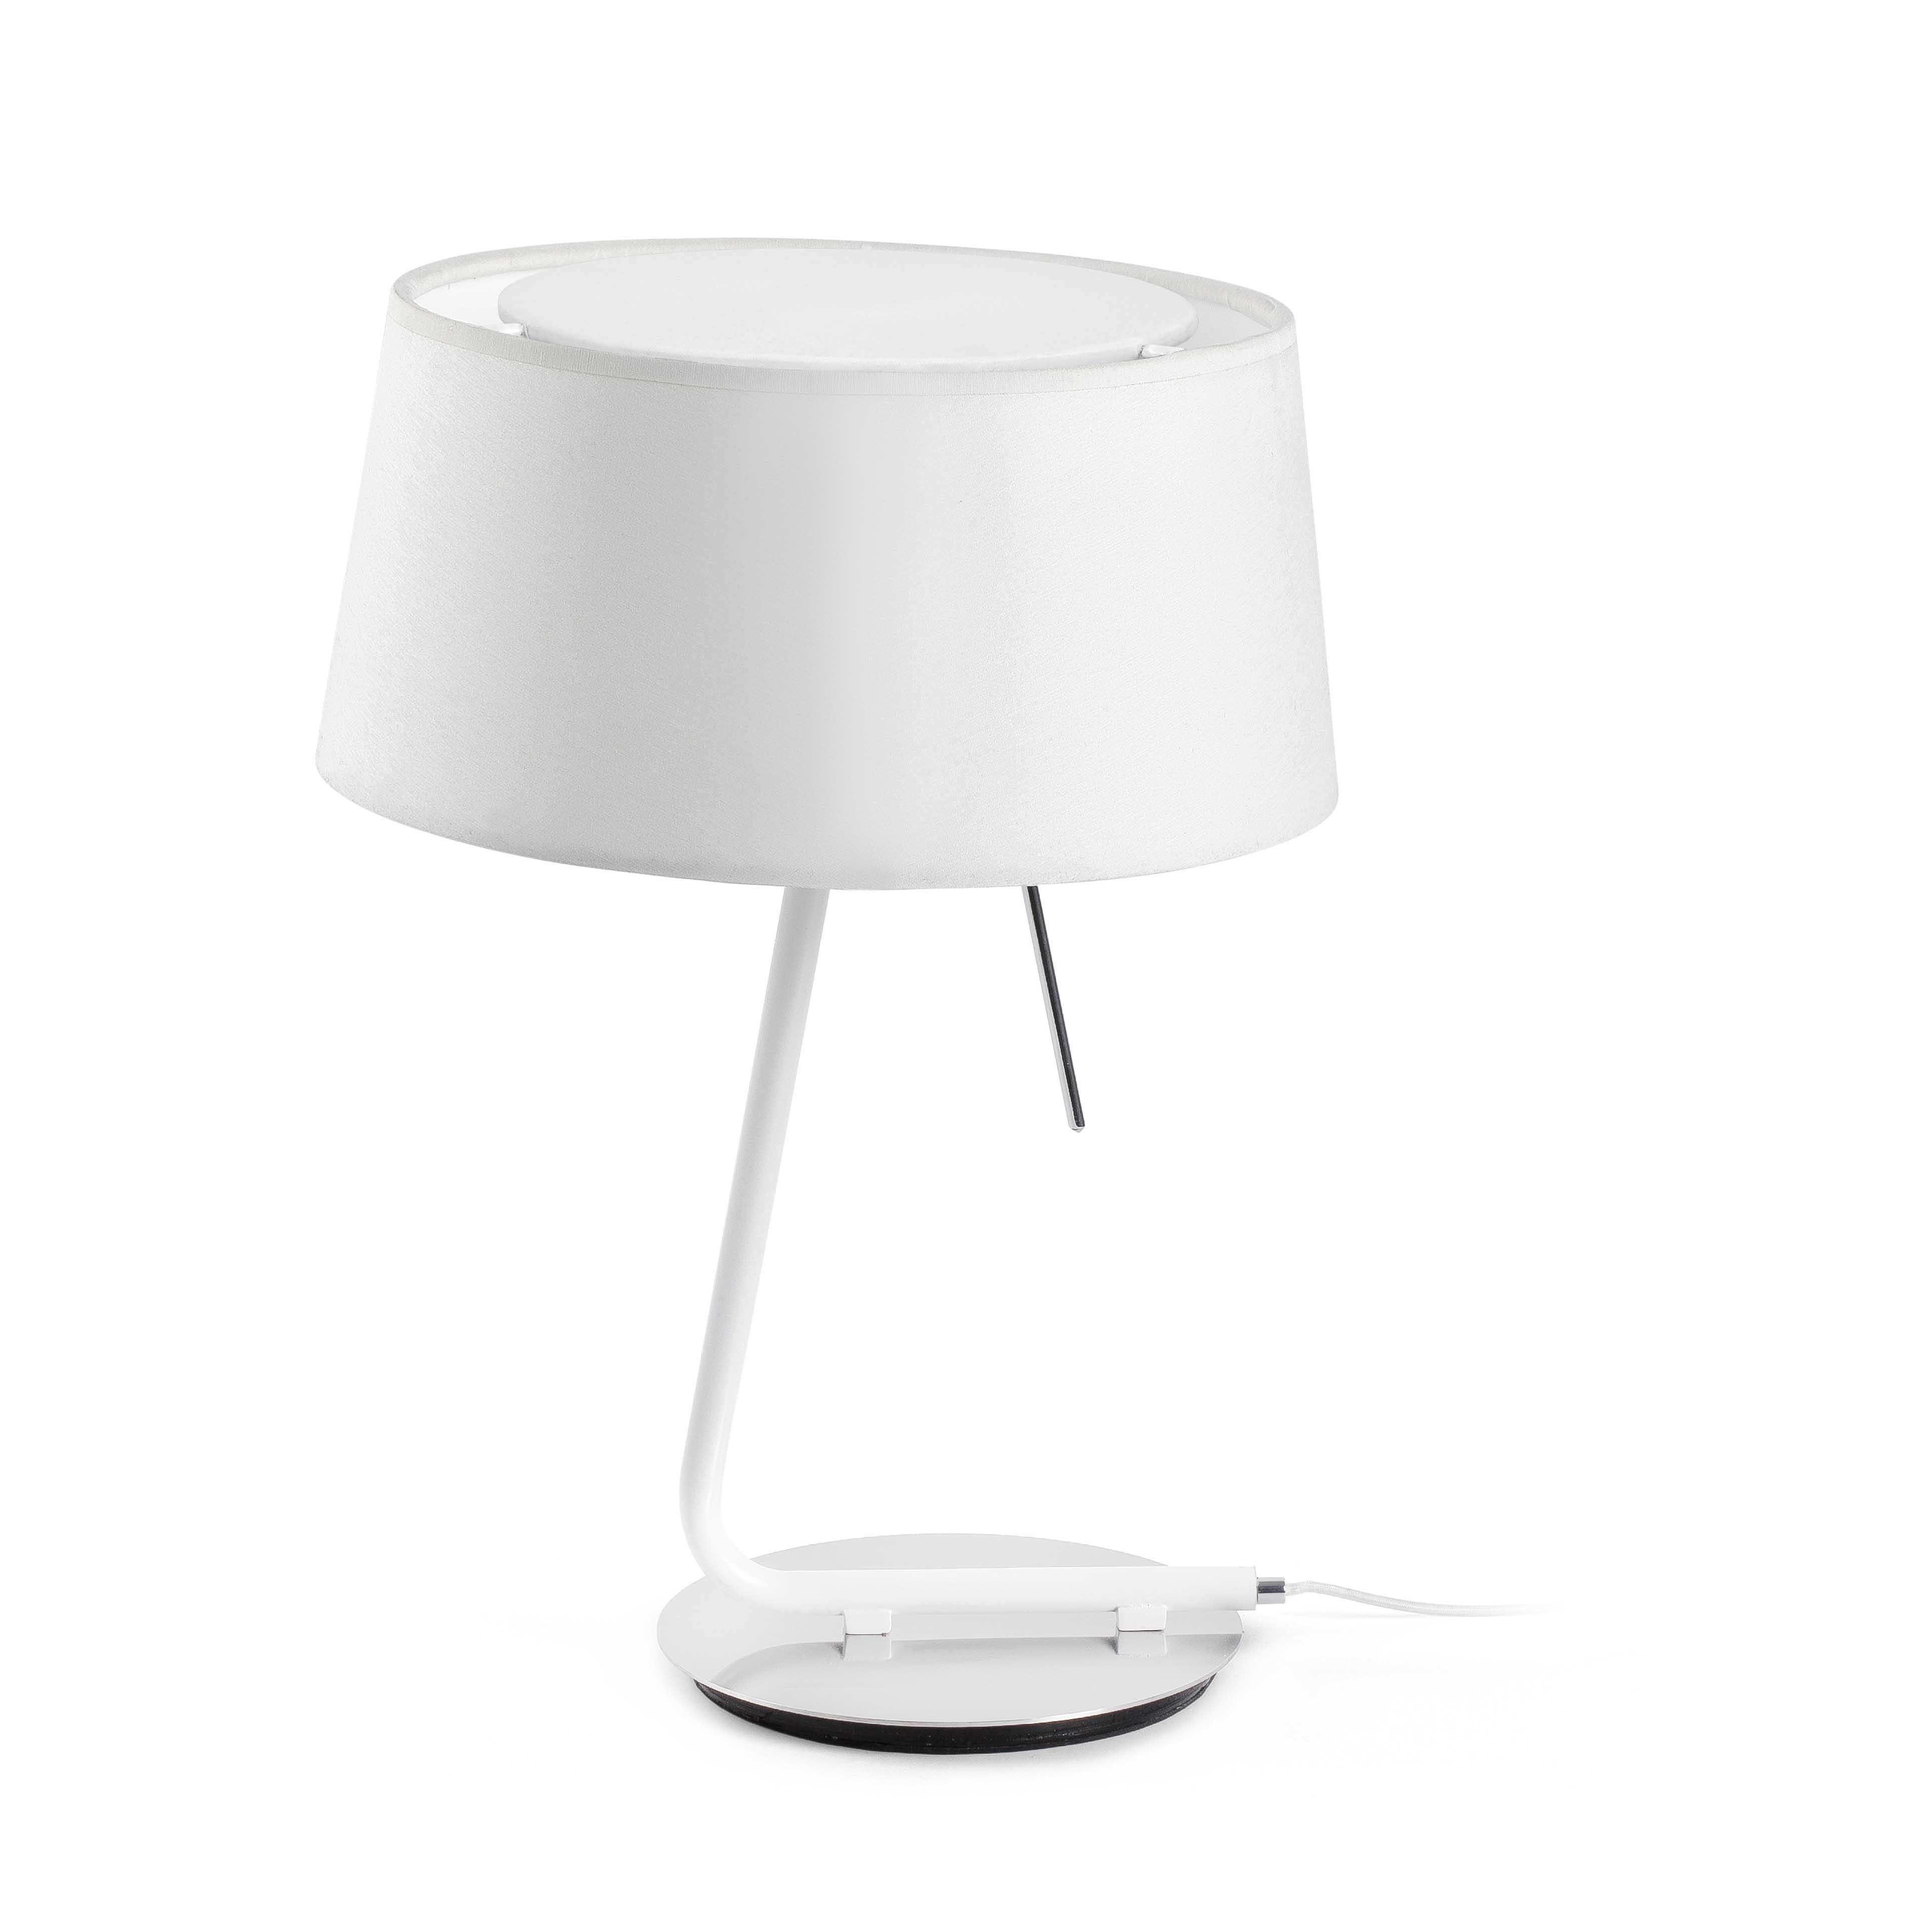 lampe poser h tel blanc h37cm faro luminaires nedgis. Black Bedroom Furniture Sets. Home Design Ideas